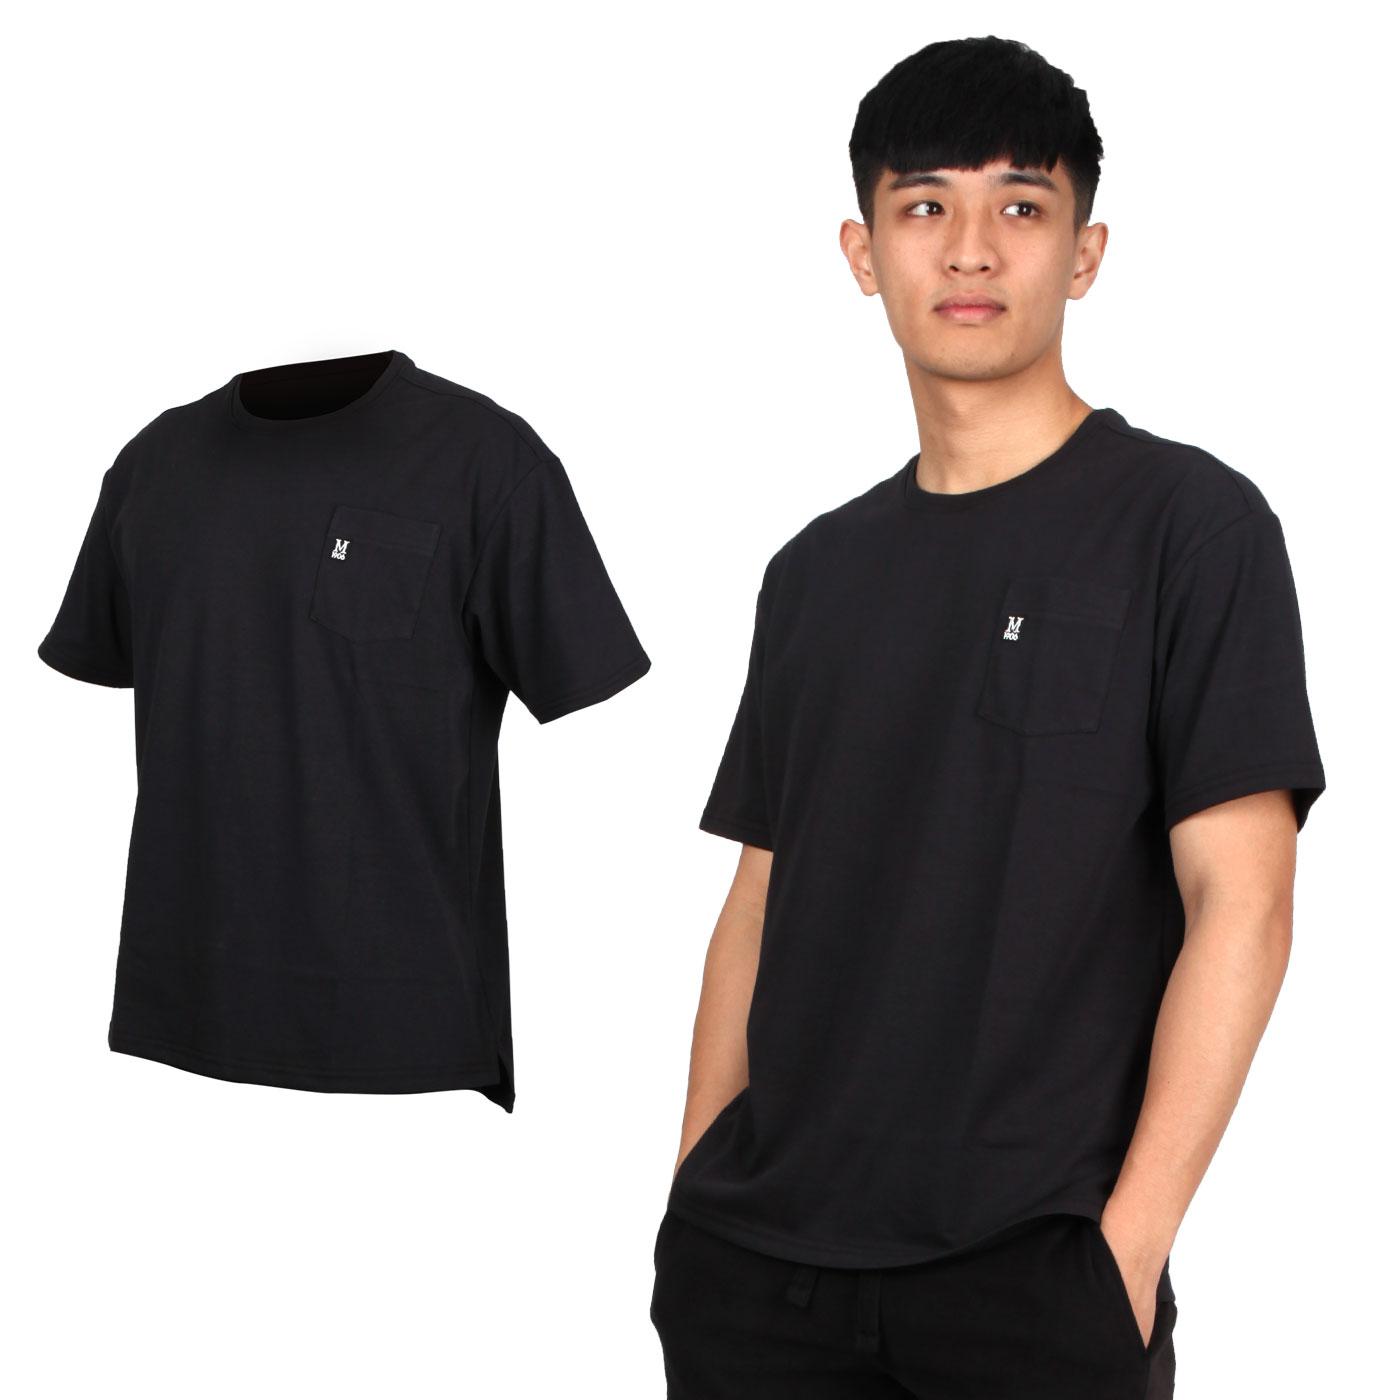 MIZUNO 男款1906系列短袖T恤 D2TA000101 - 黑白